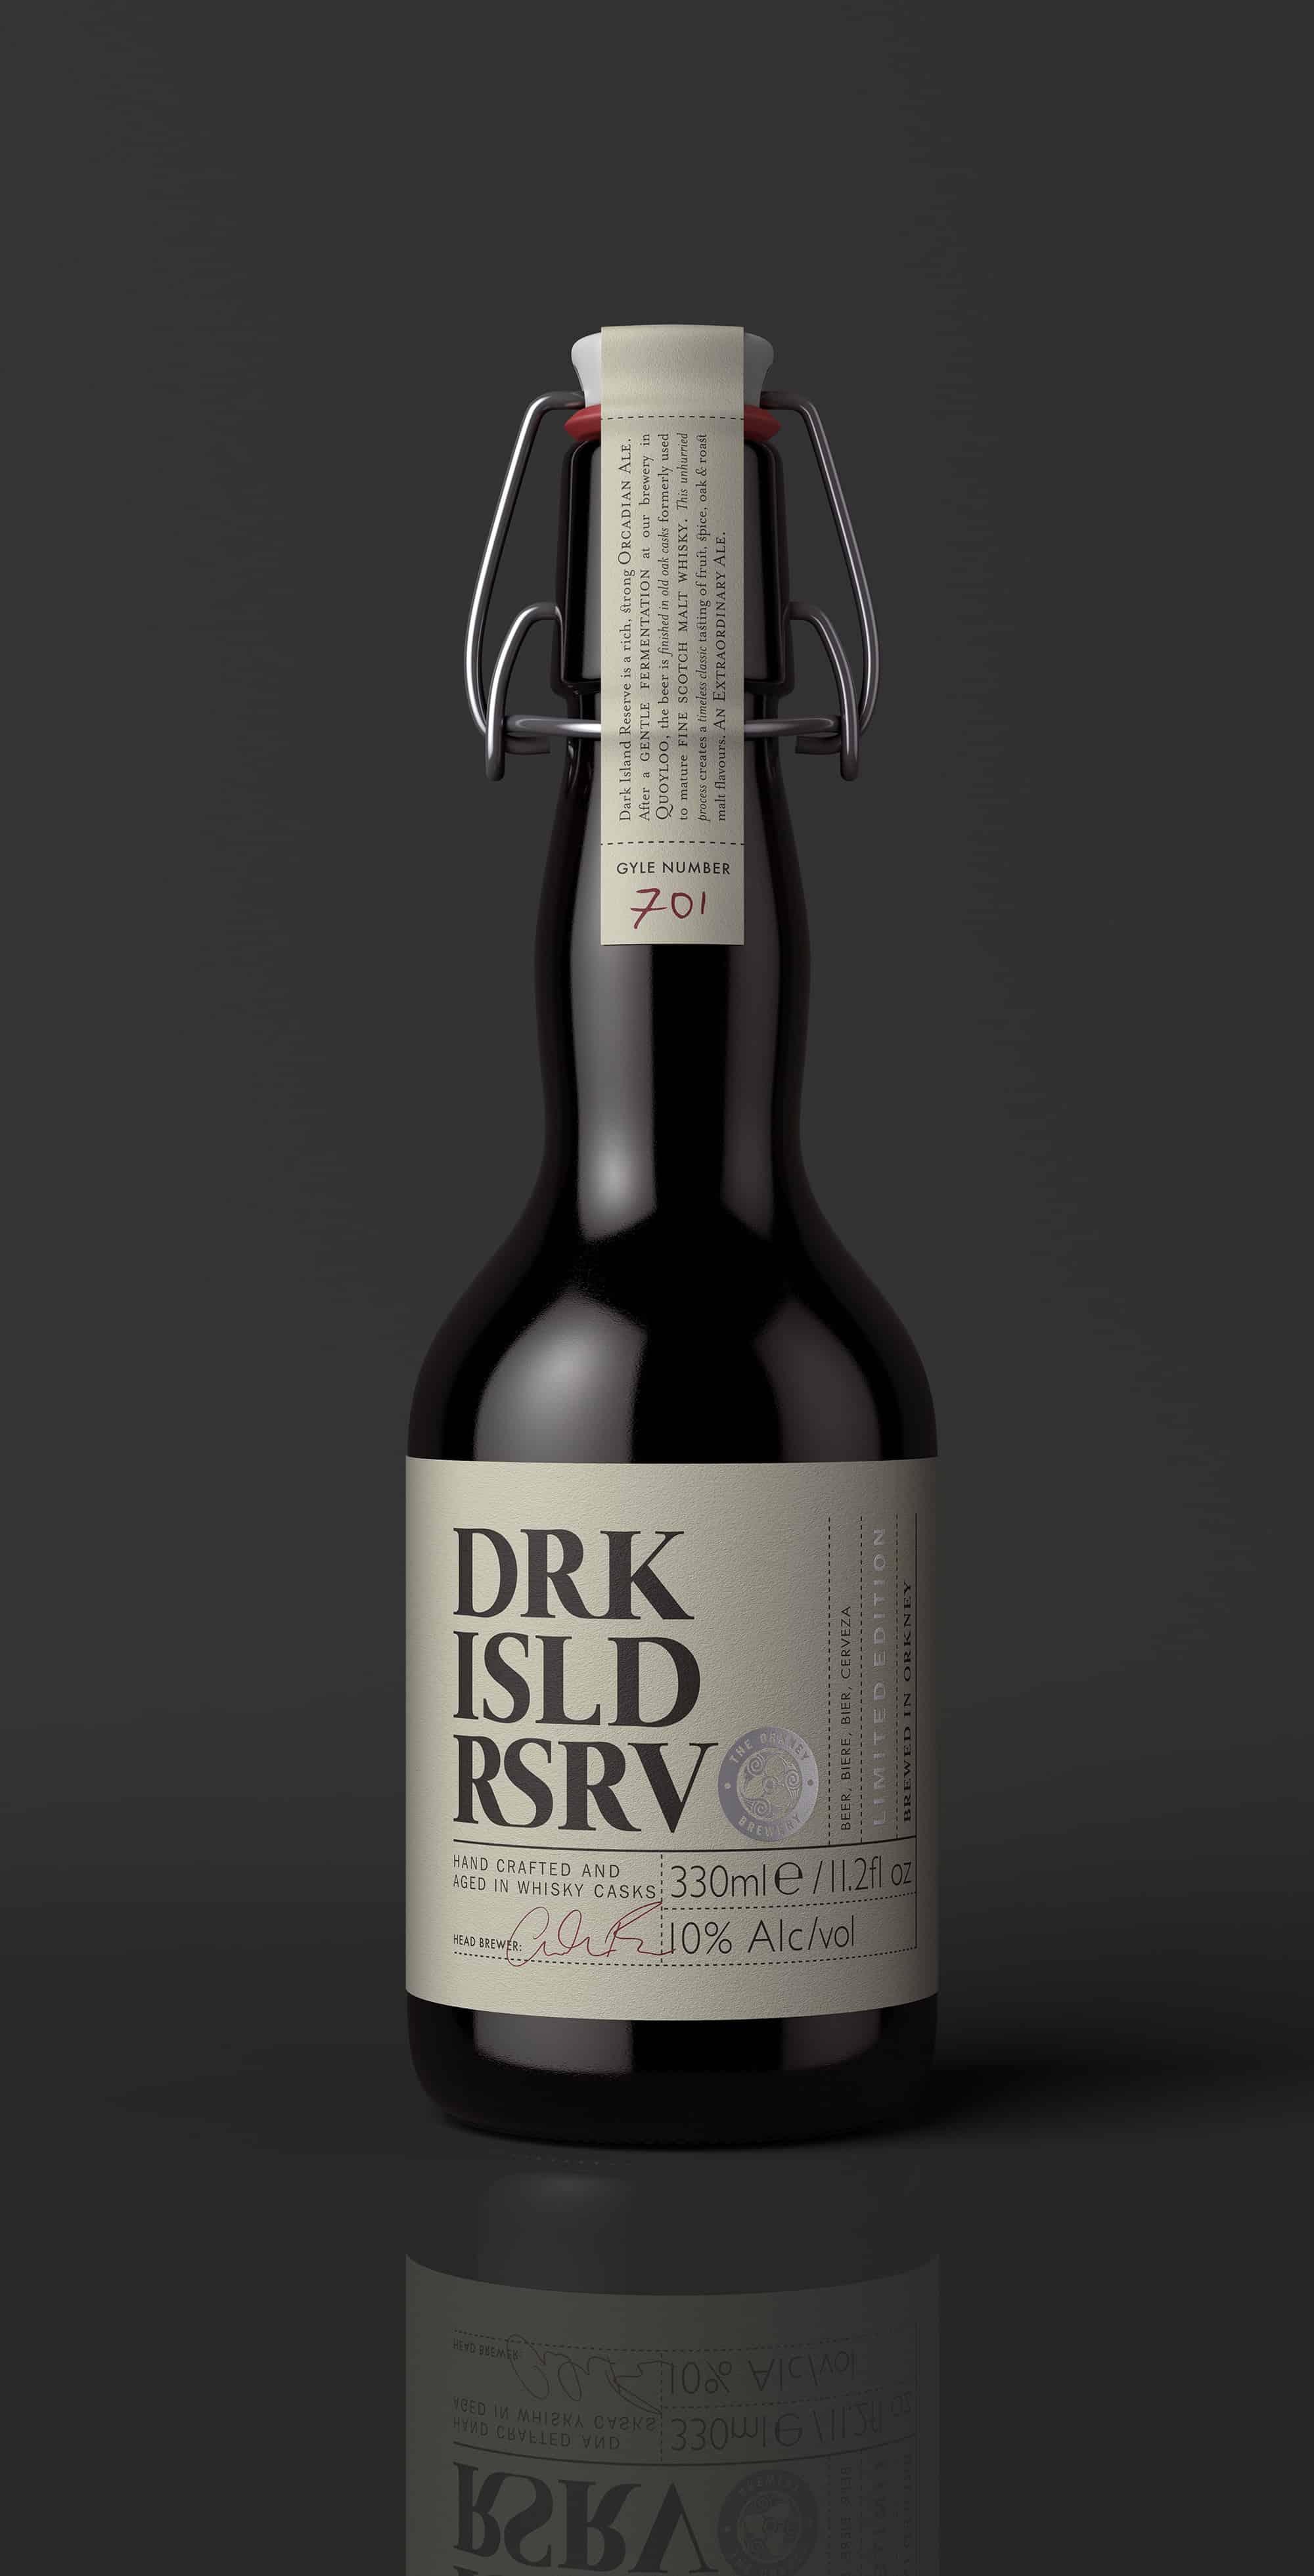 Dark Island Reserve 330ml11